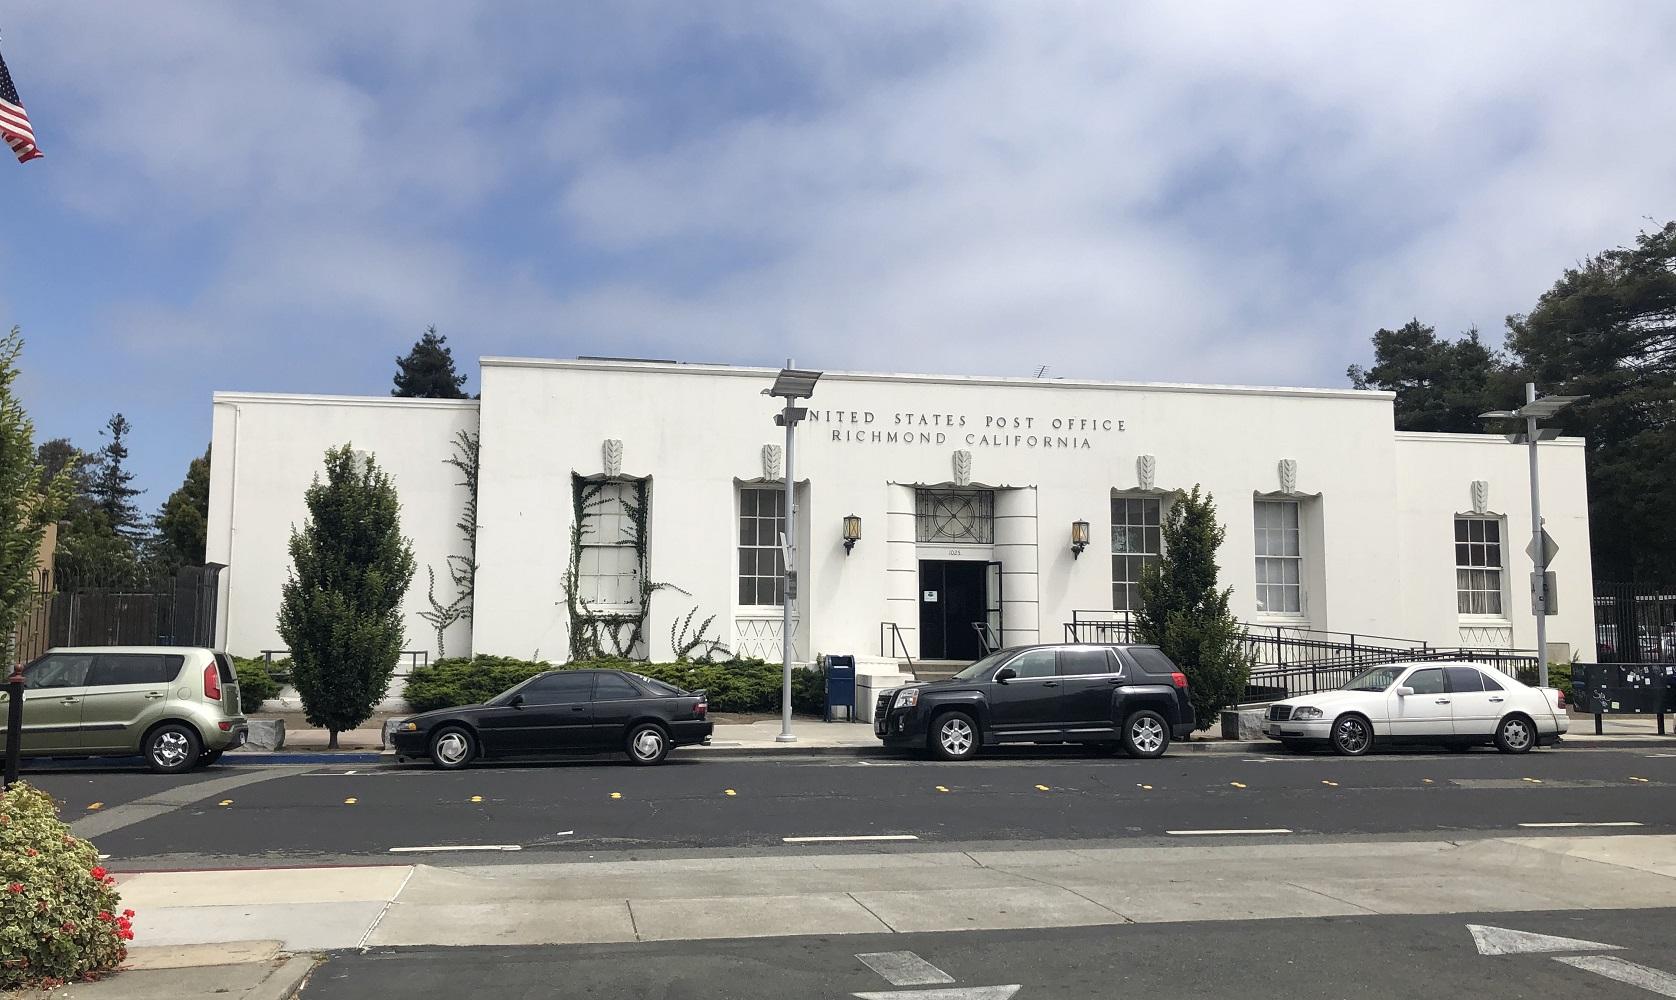 Richmond Main Post Office today